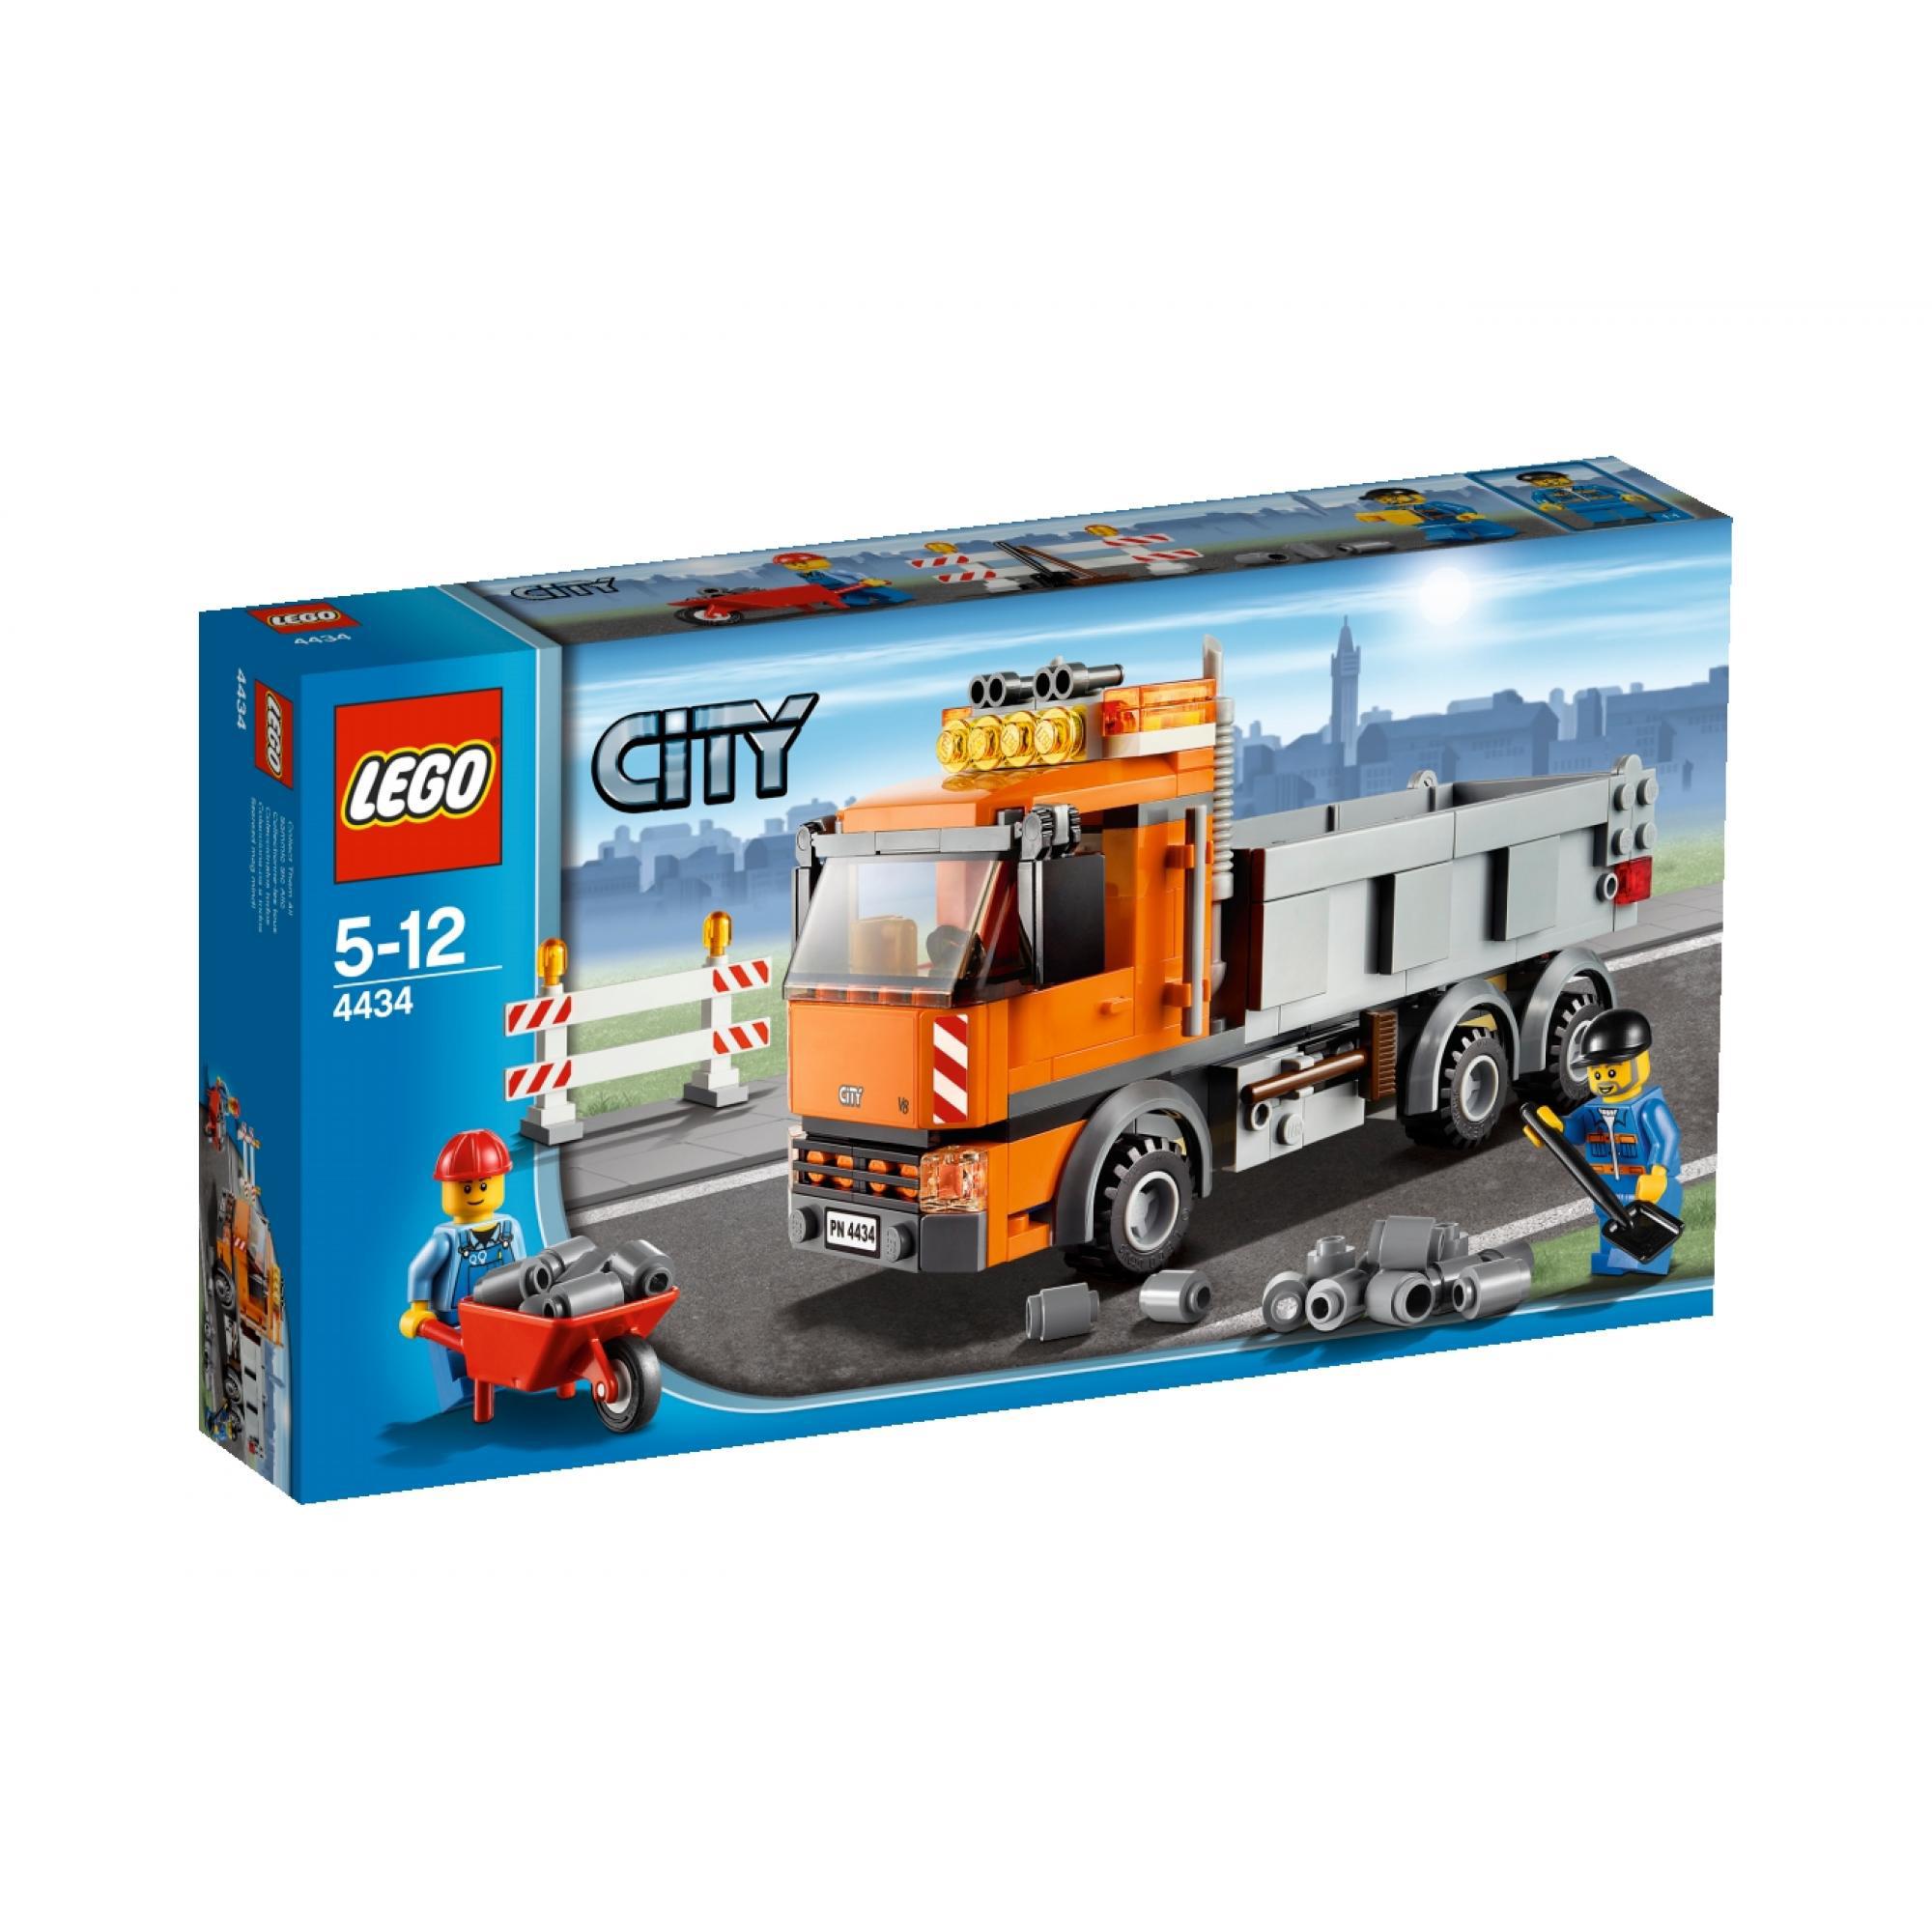 4434 dump truck brickipedia fandom powered by wikia - Image lego city ...